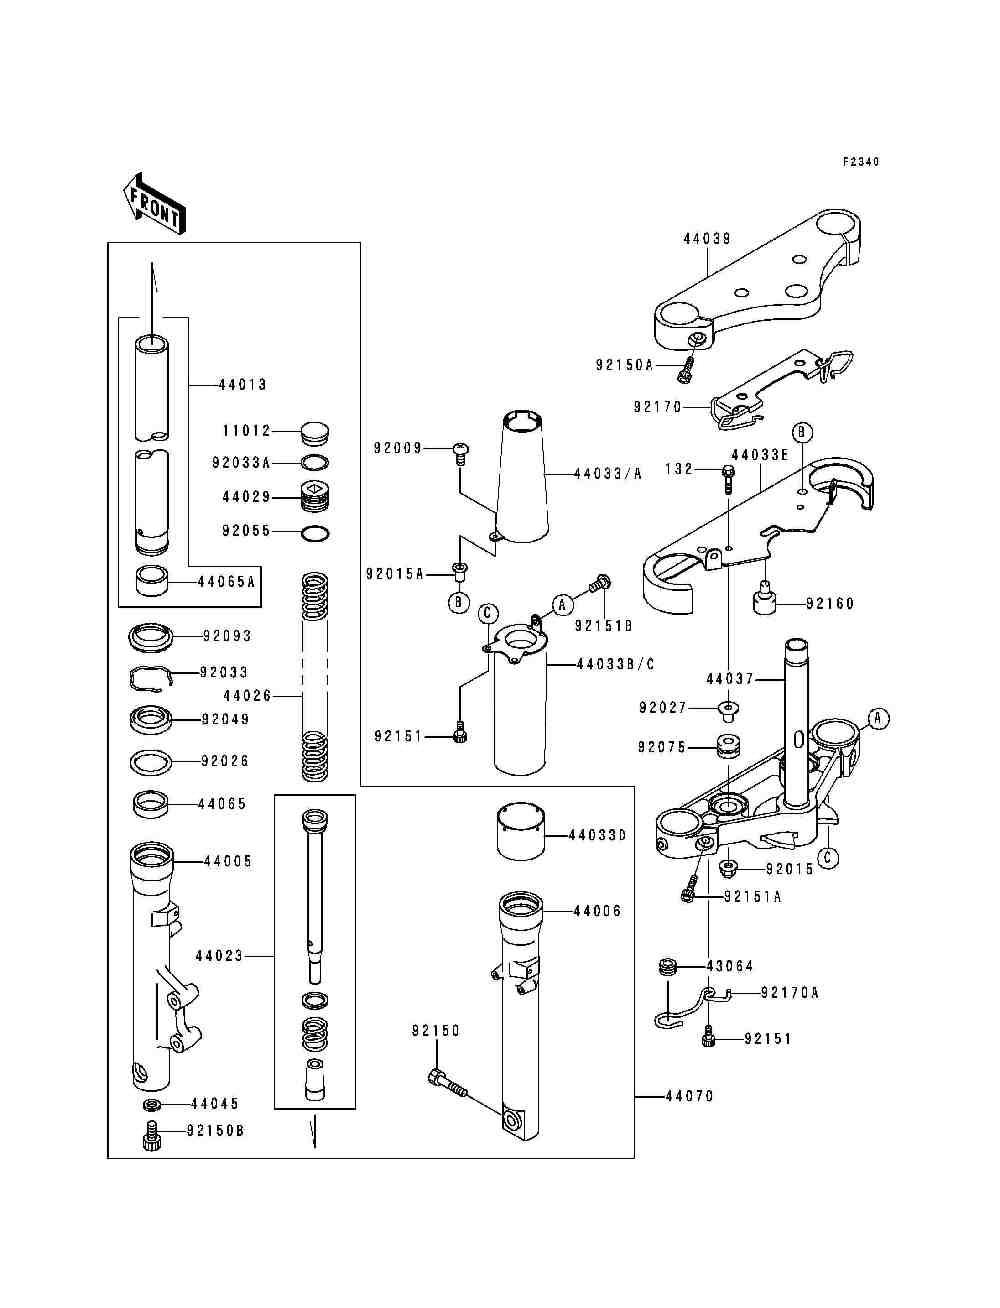 2006 kawasaki brute force 750 wiring diagram rv cable tv - imageresizertool.com